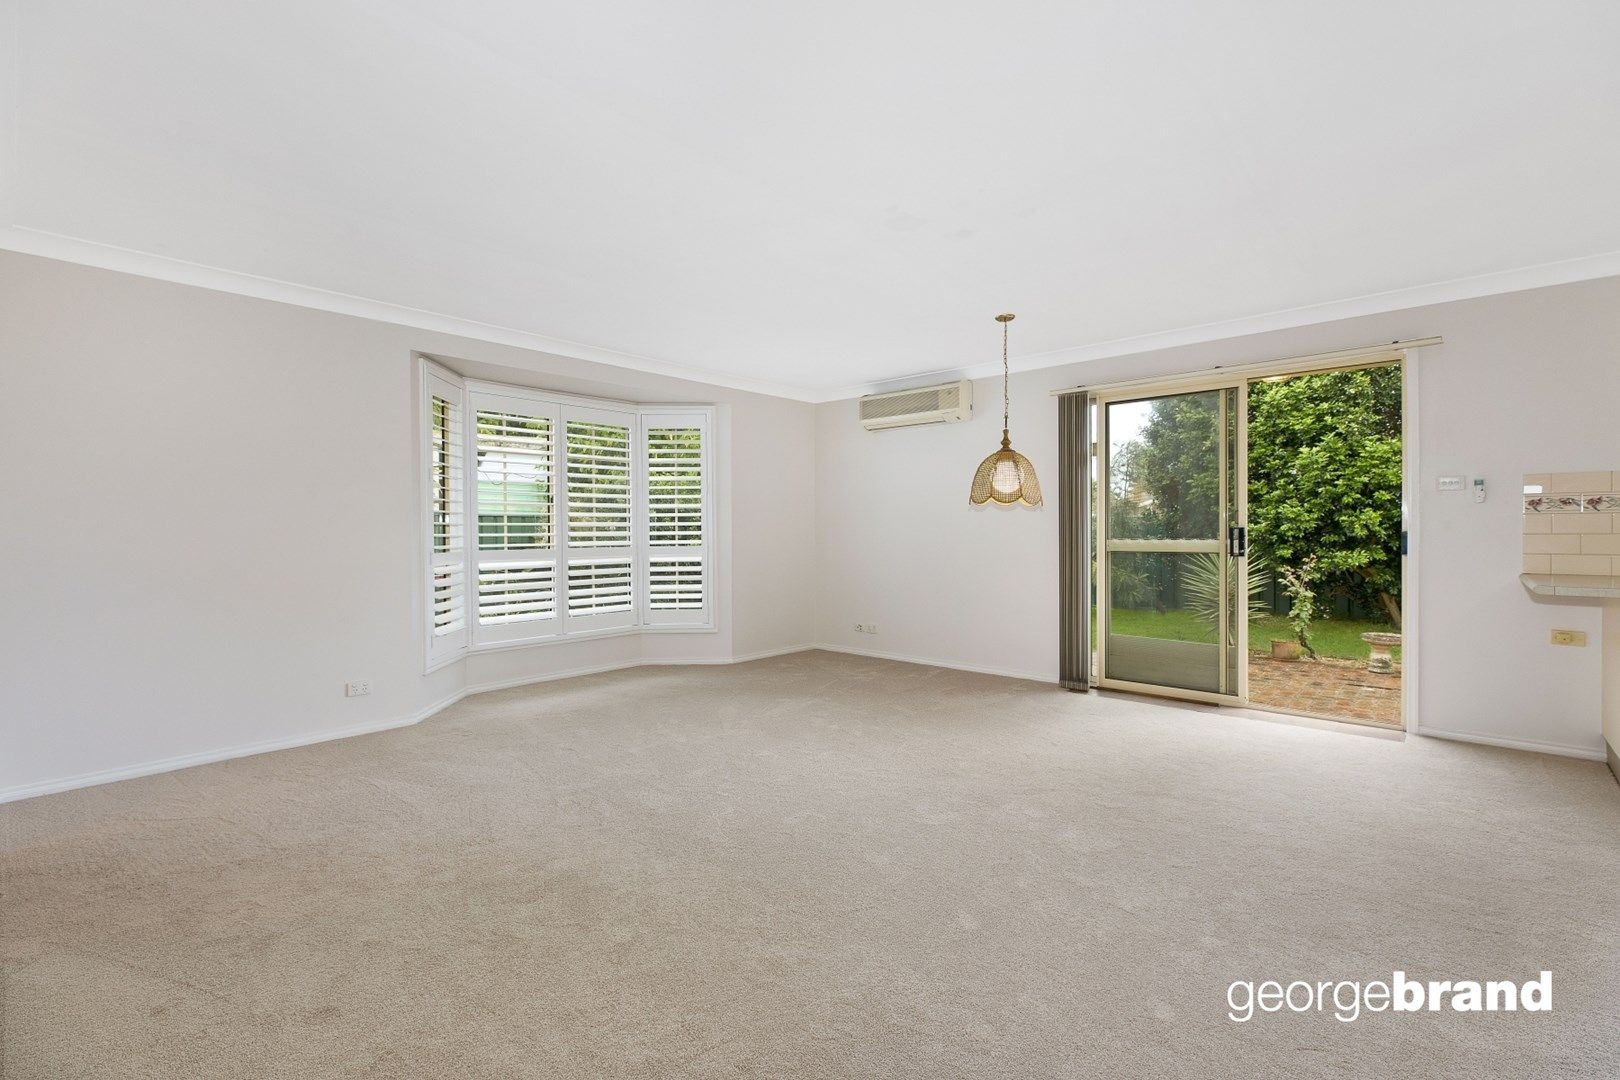 2/10 Kitchener Road, Long Jetty NSW 2261, Image 0